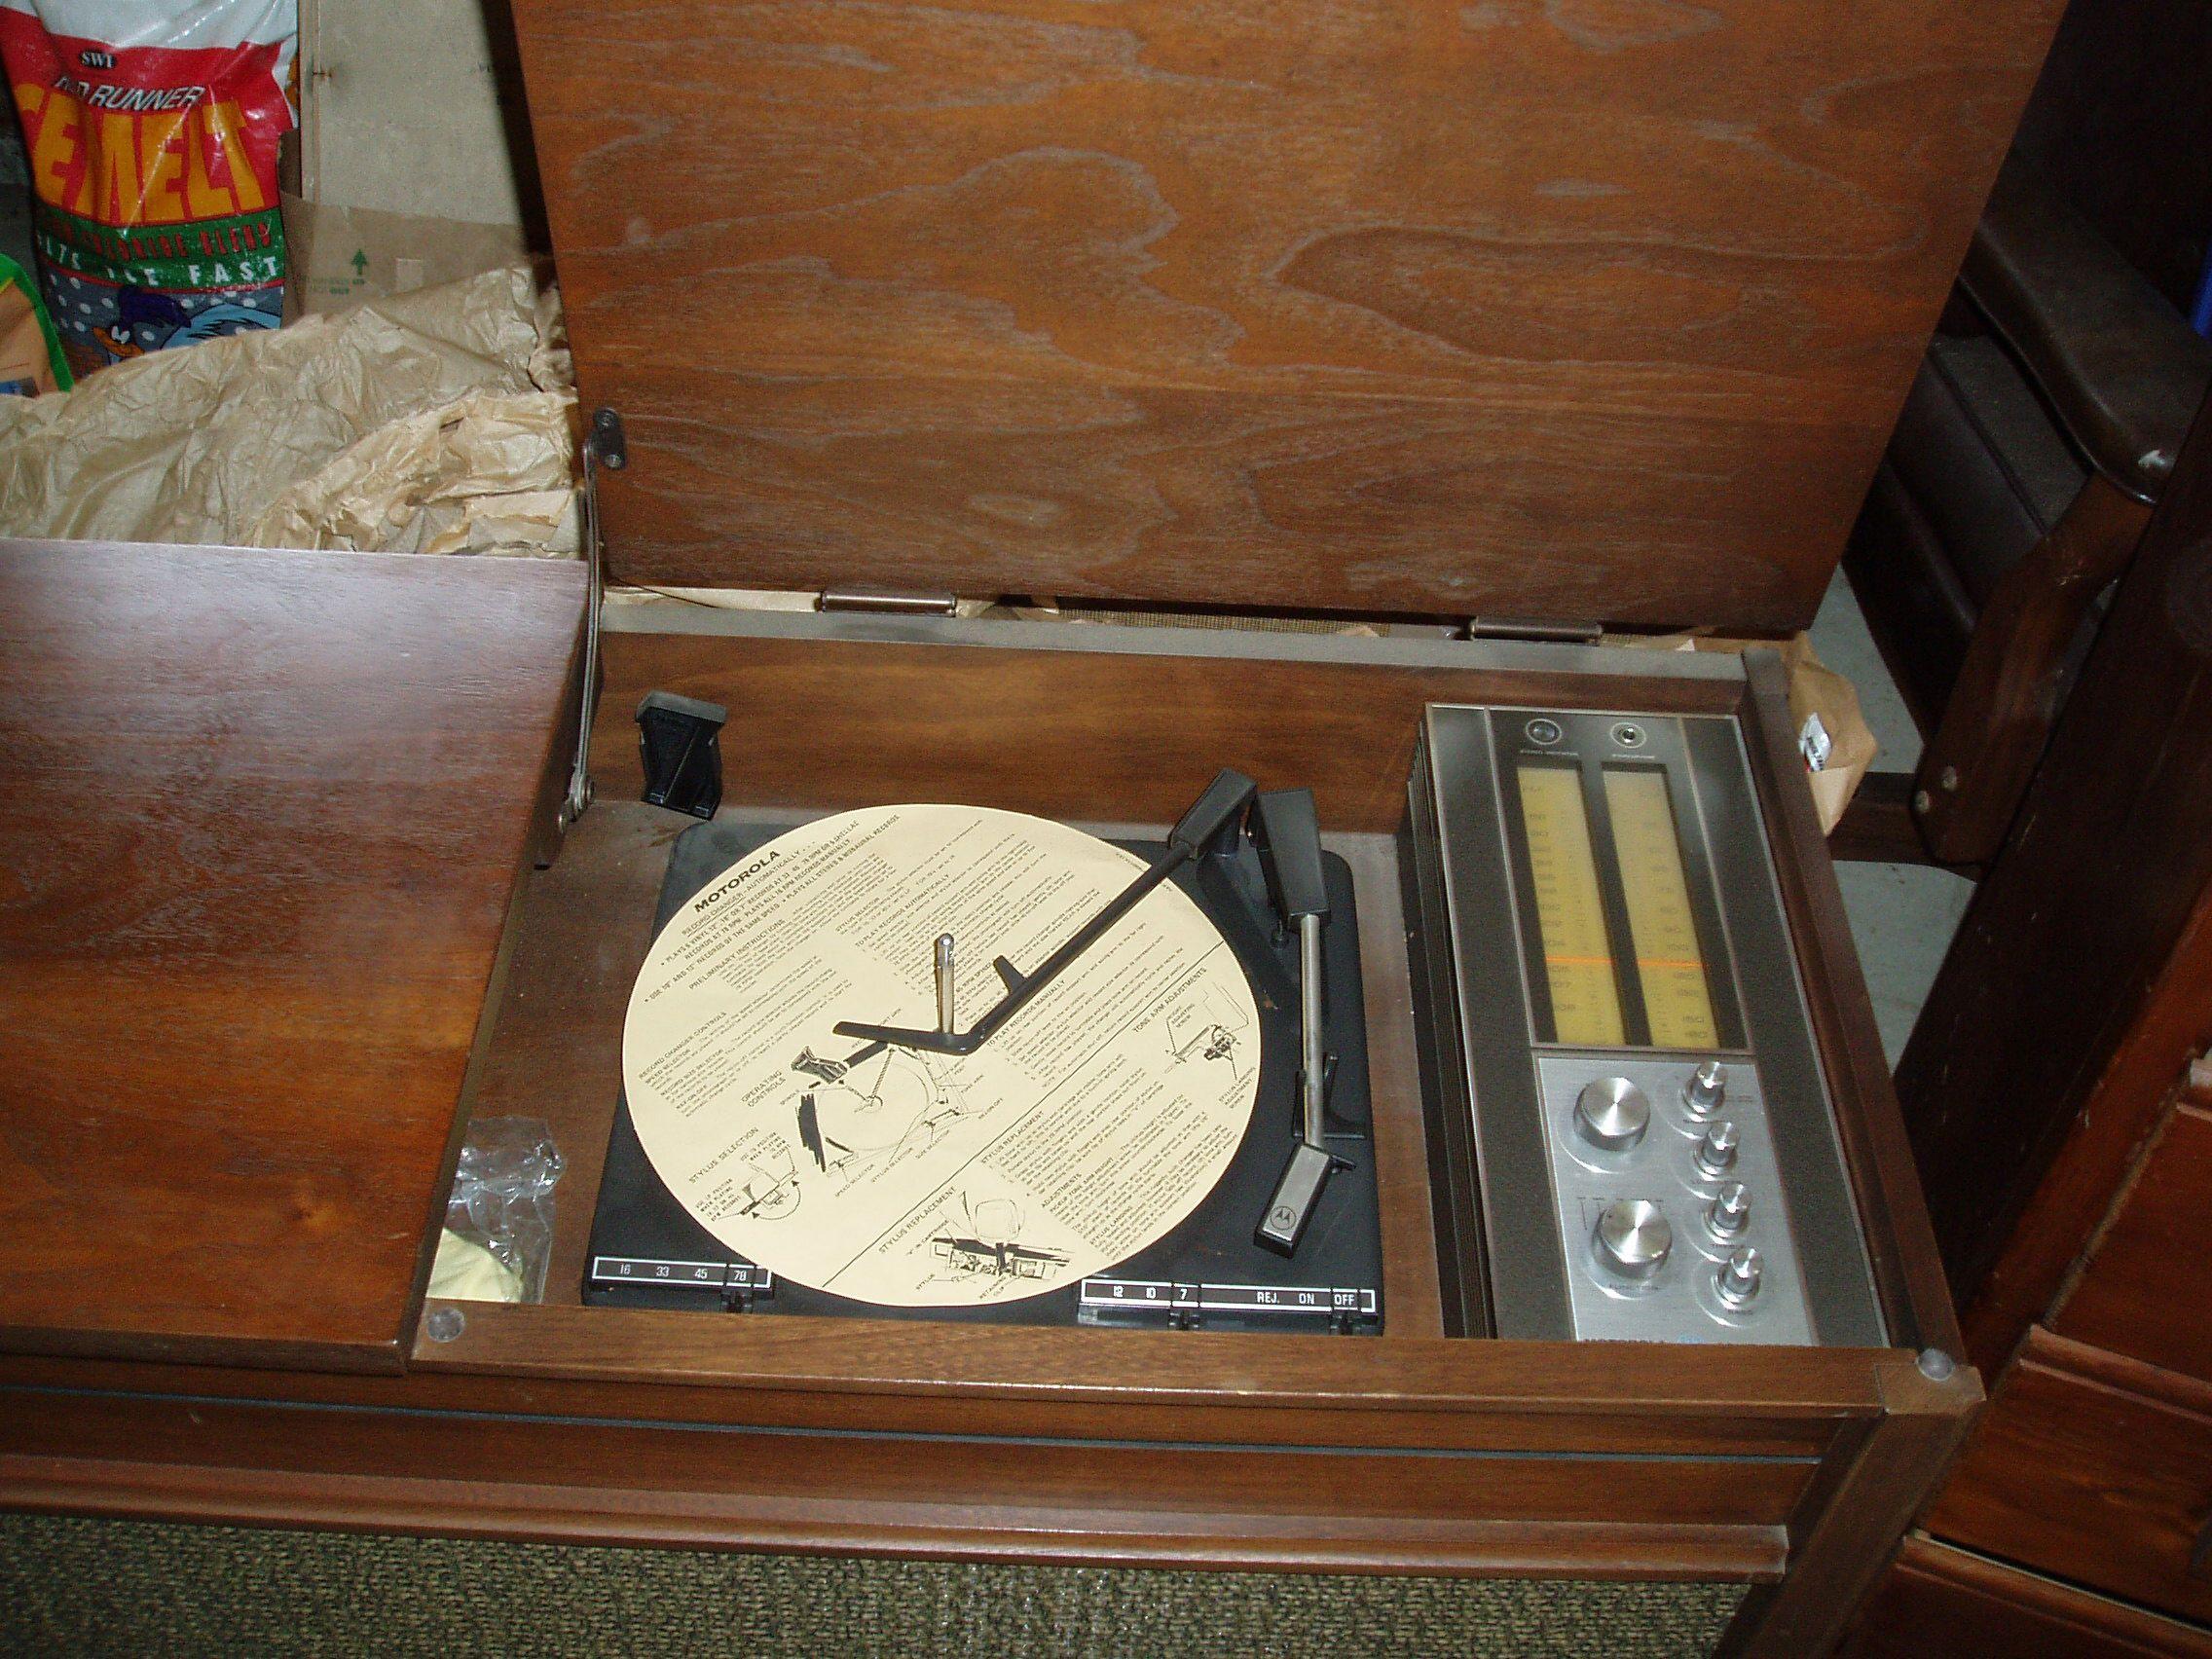 1969 (?) Motorola record player/radio console antique appraisal ...